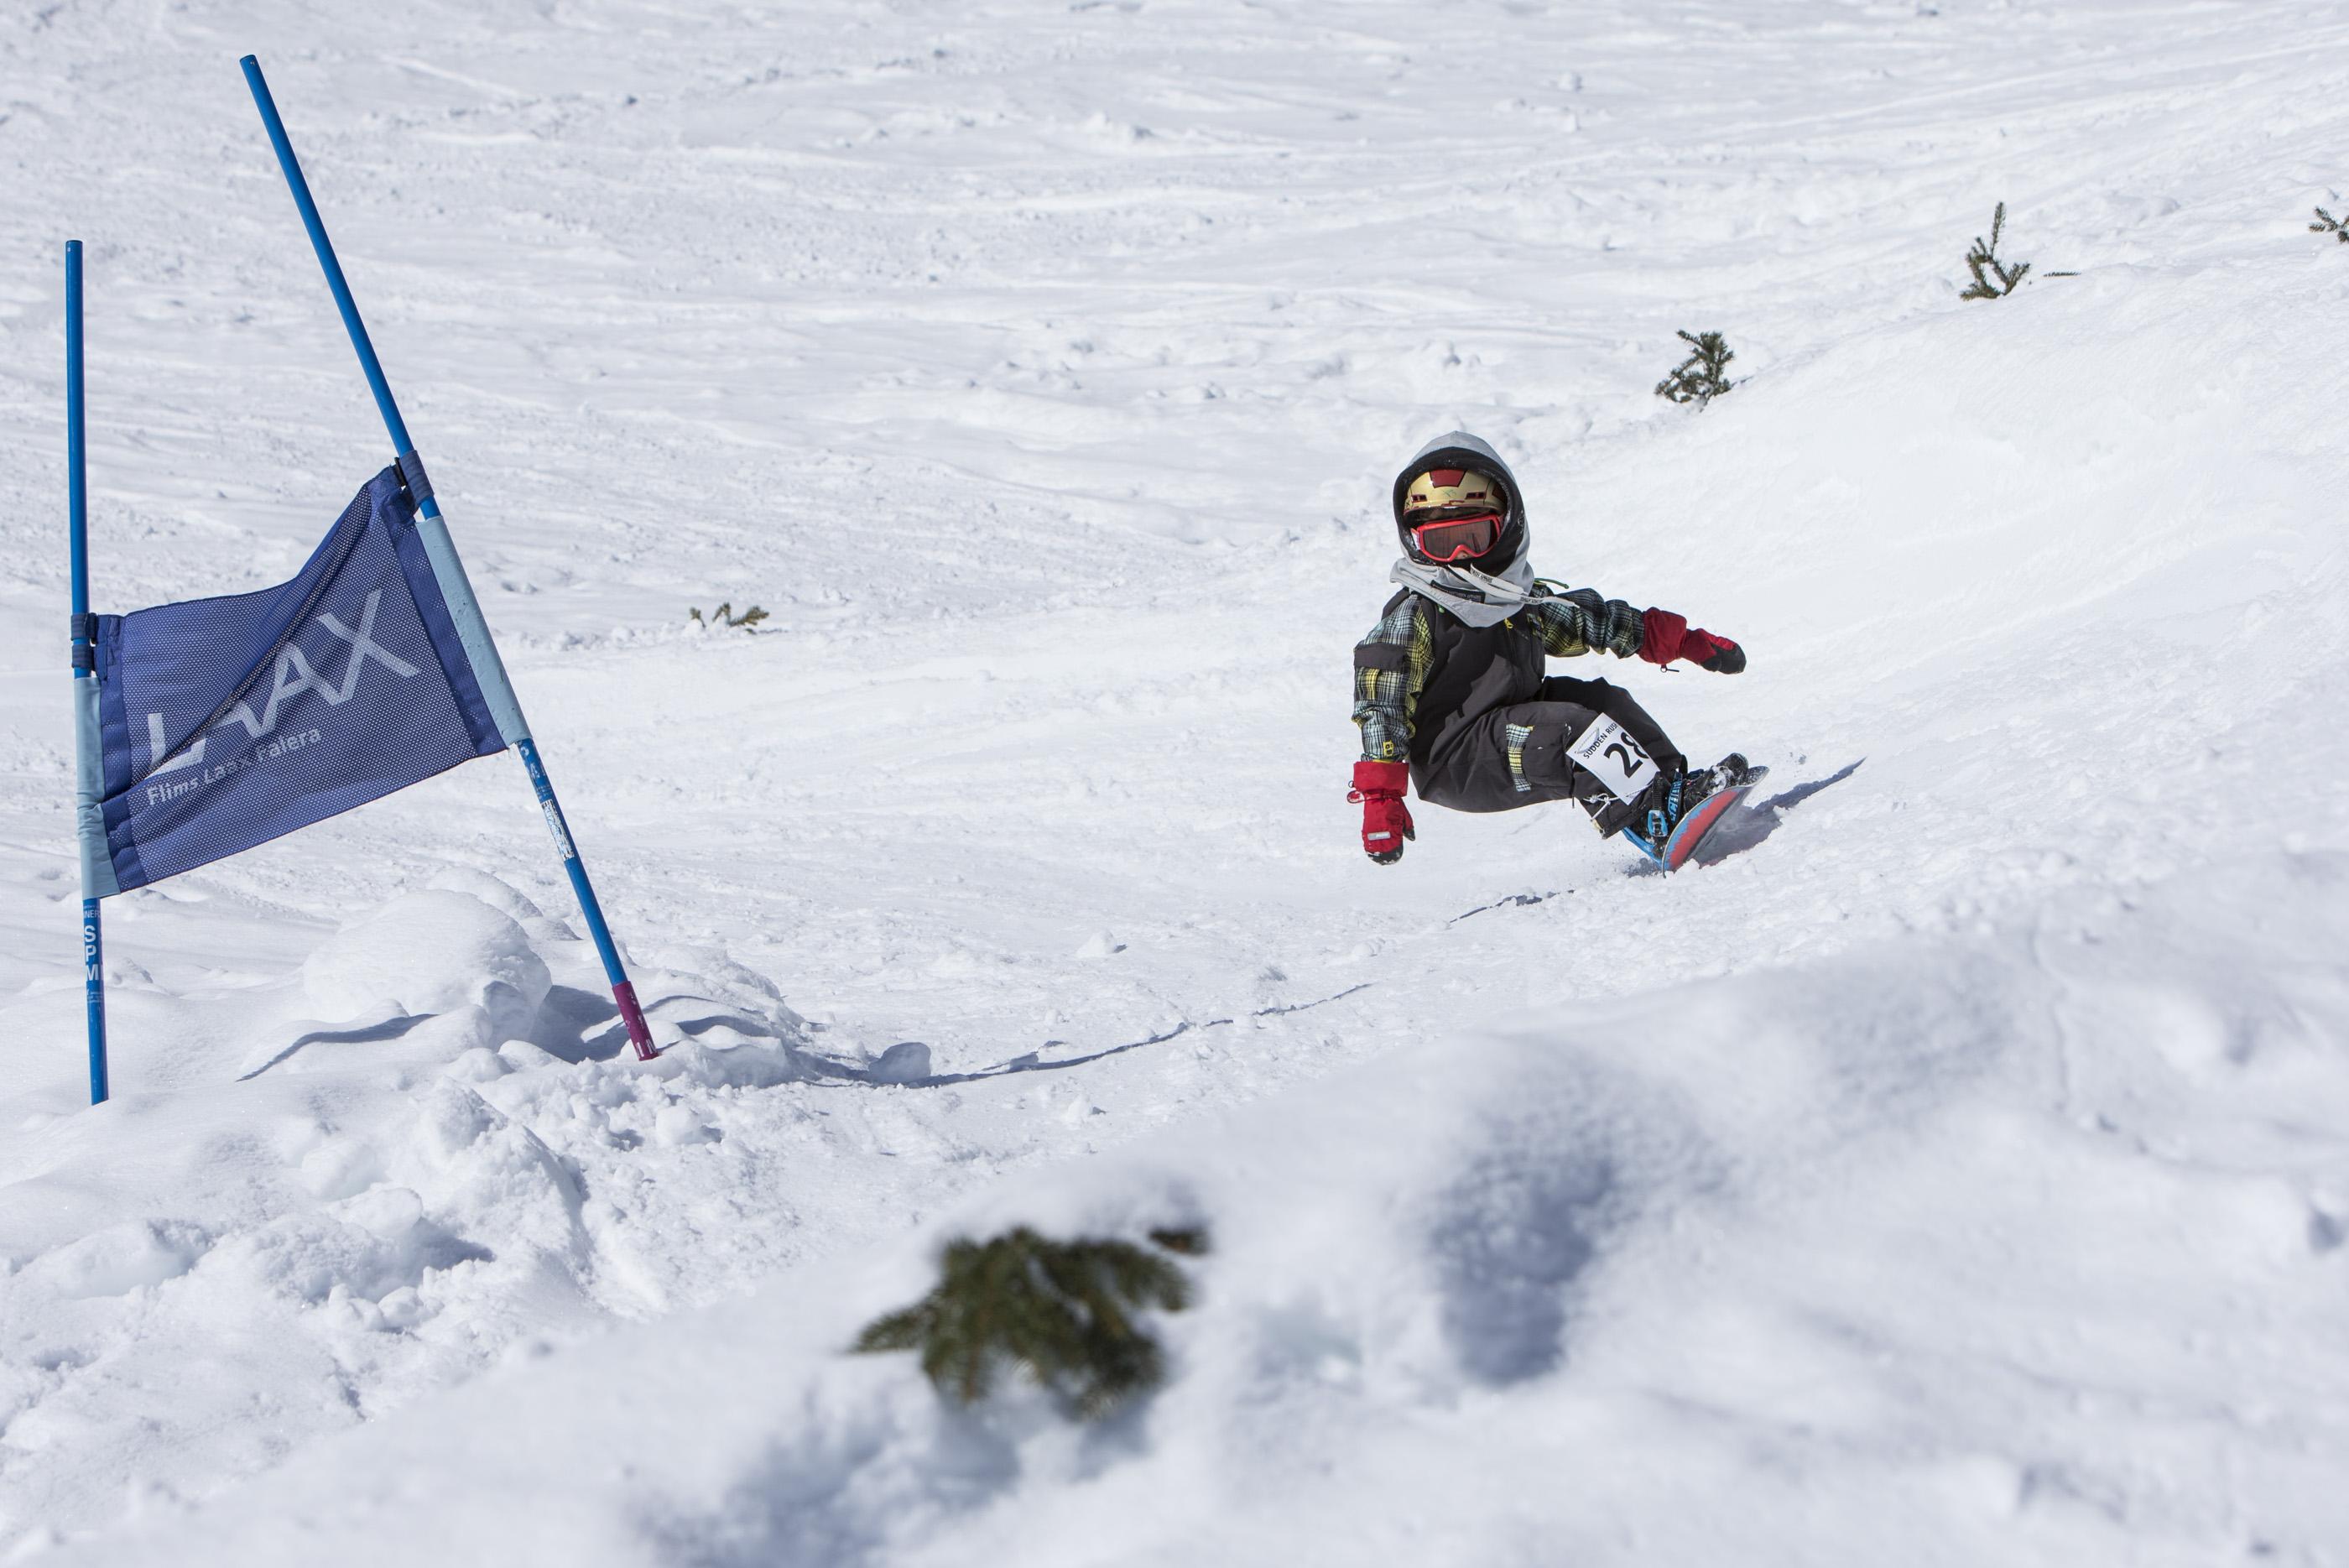 Sudden_Rush_Banked_Slalom_Laax_18_MAURO_Ruggli_226